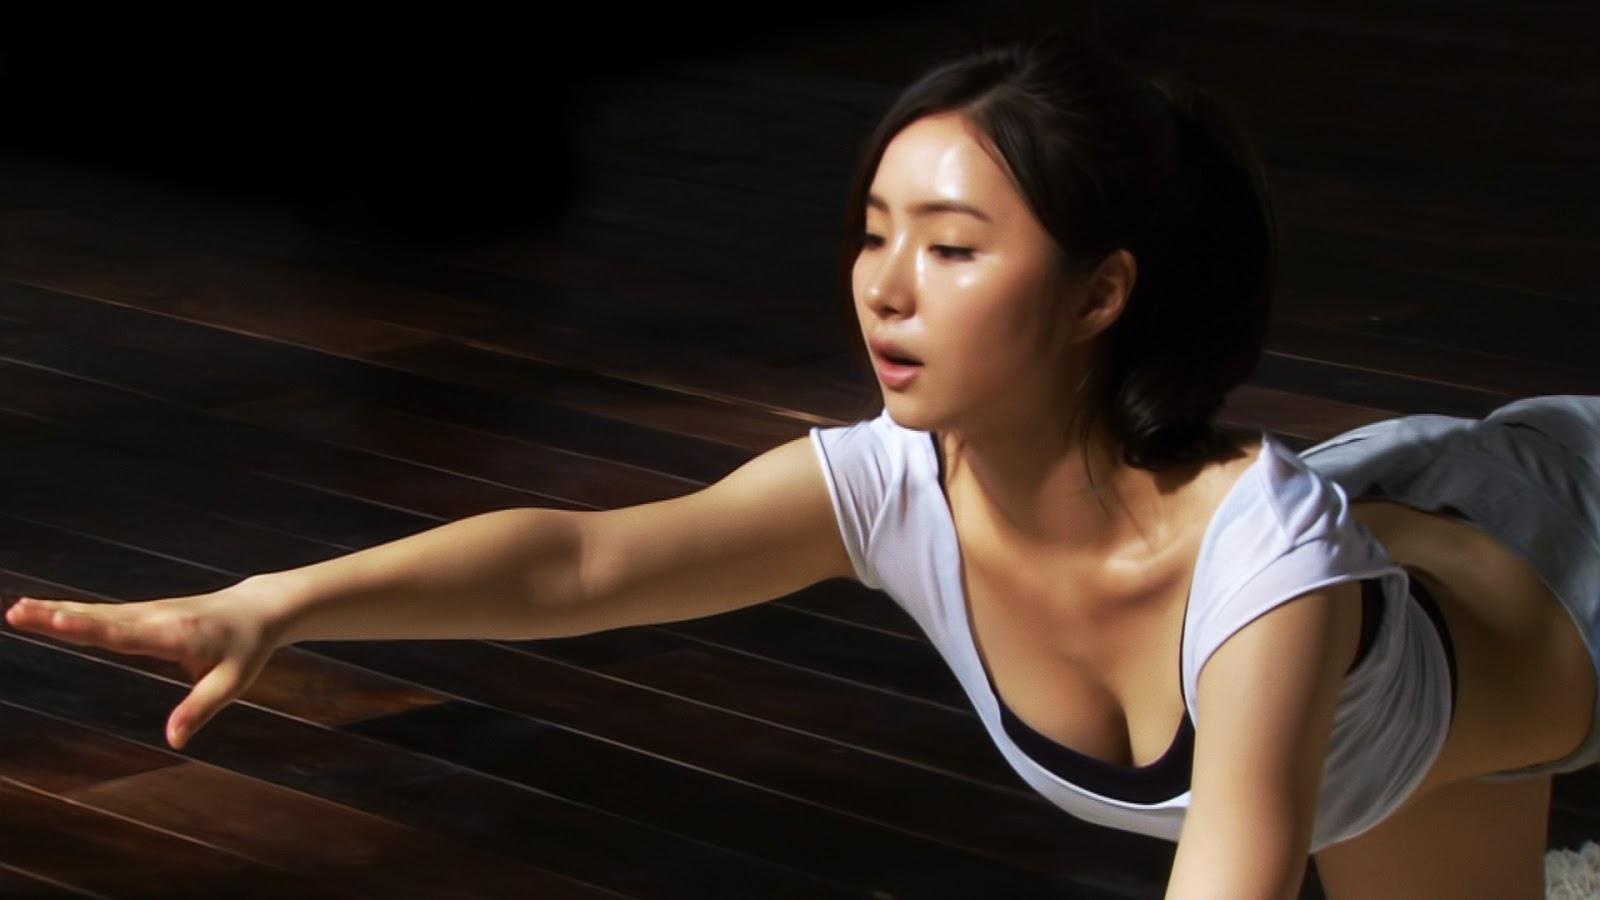 Hot Korea Girl  Korean Babes Hd Images - Hd Images -1675